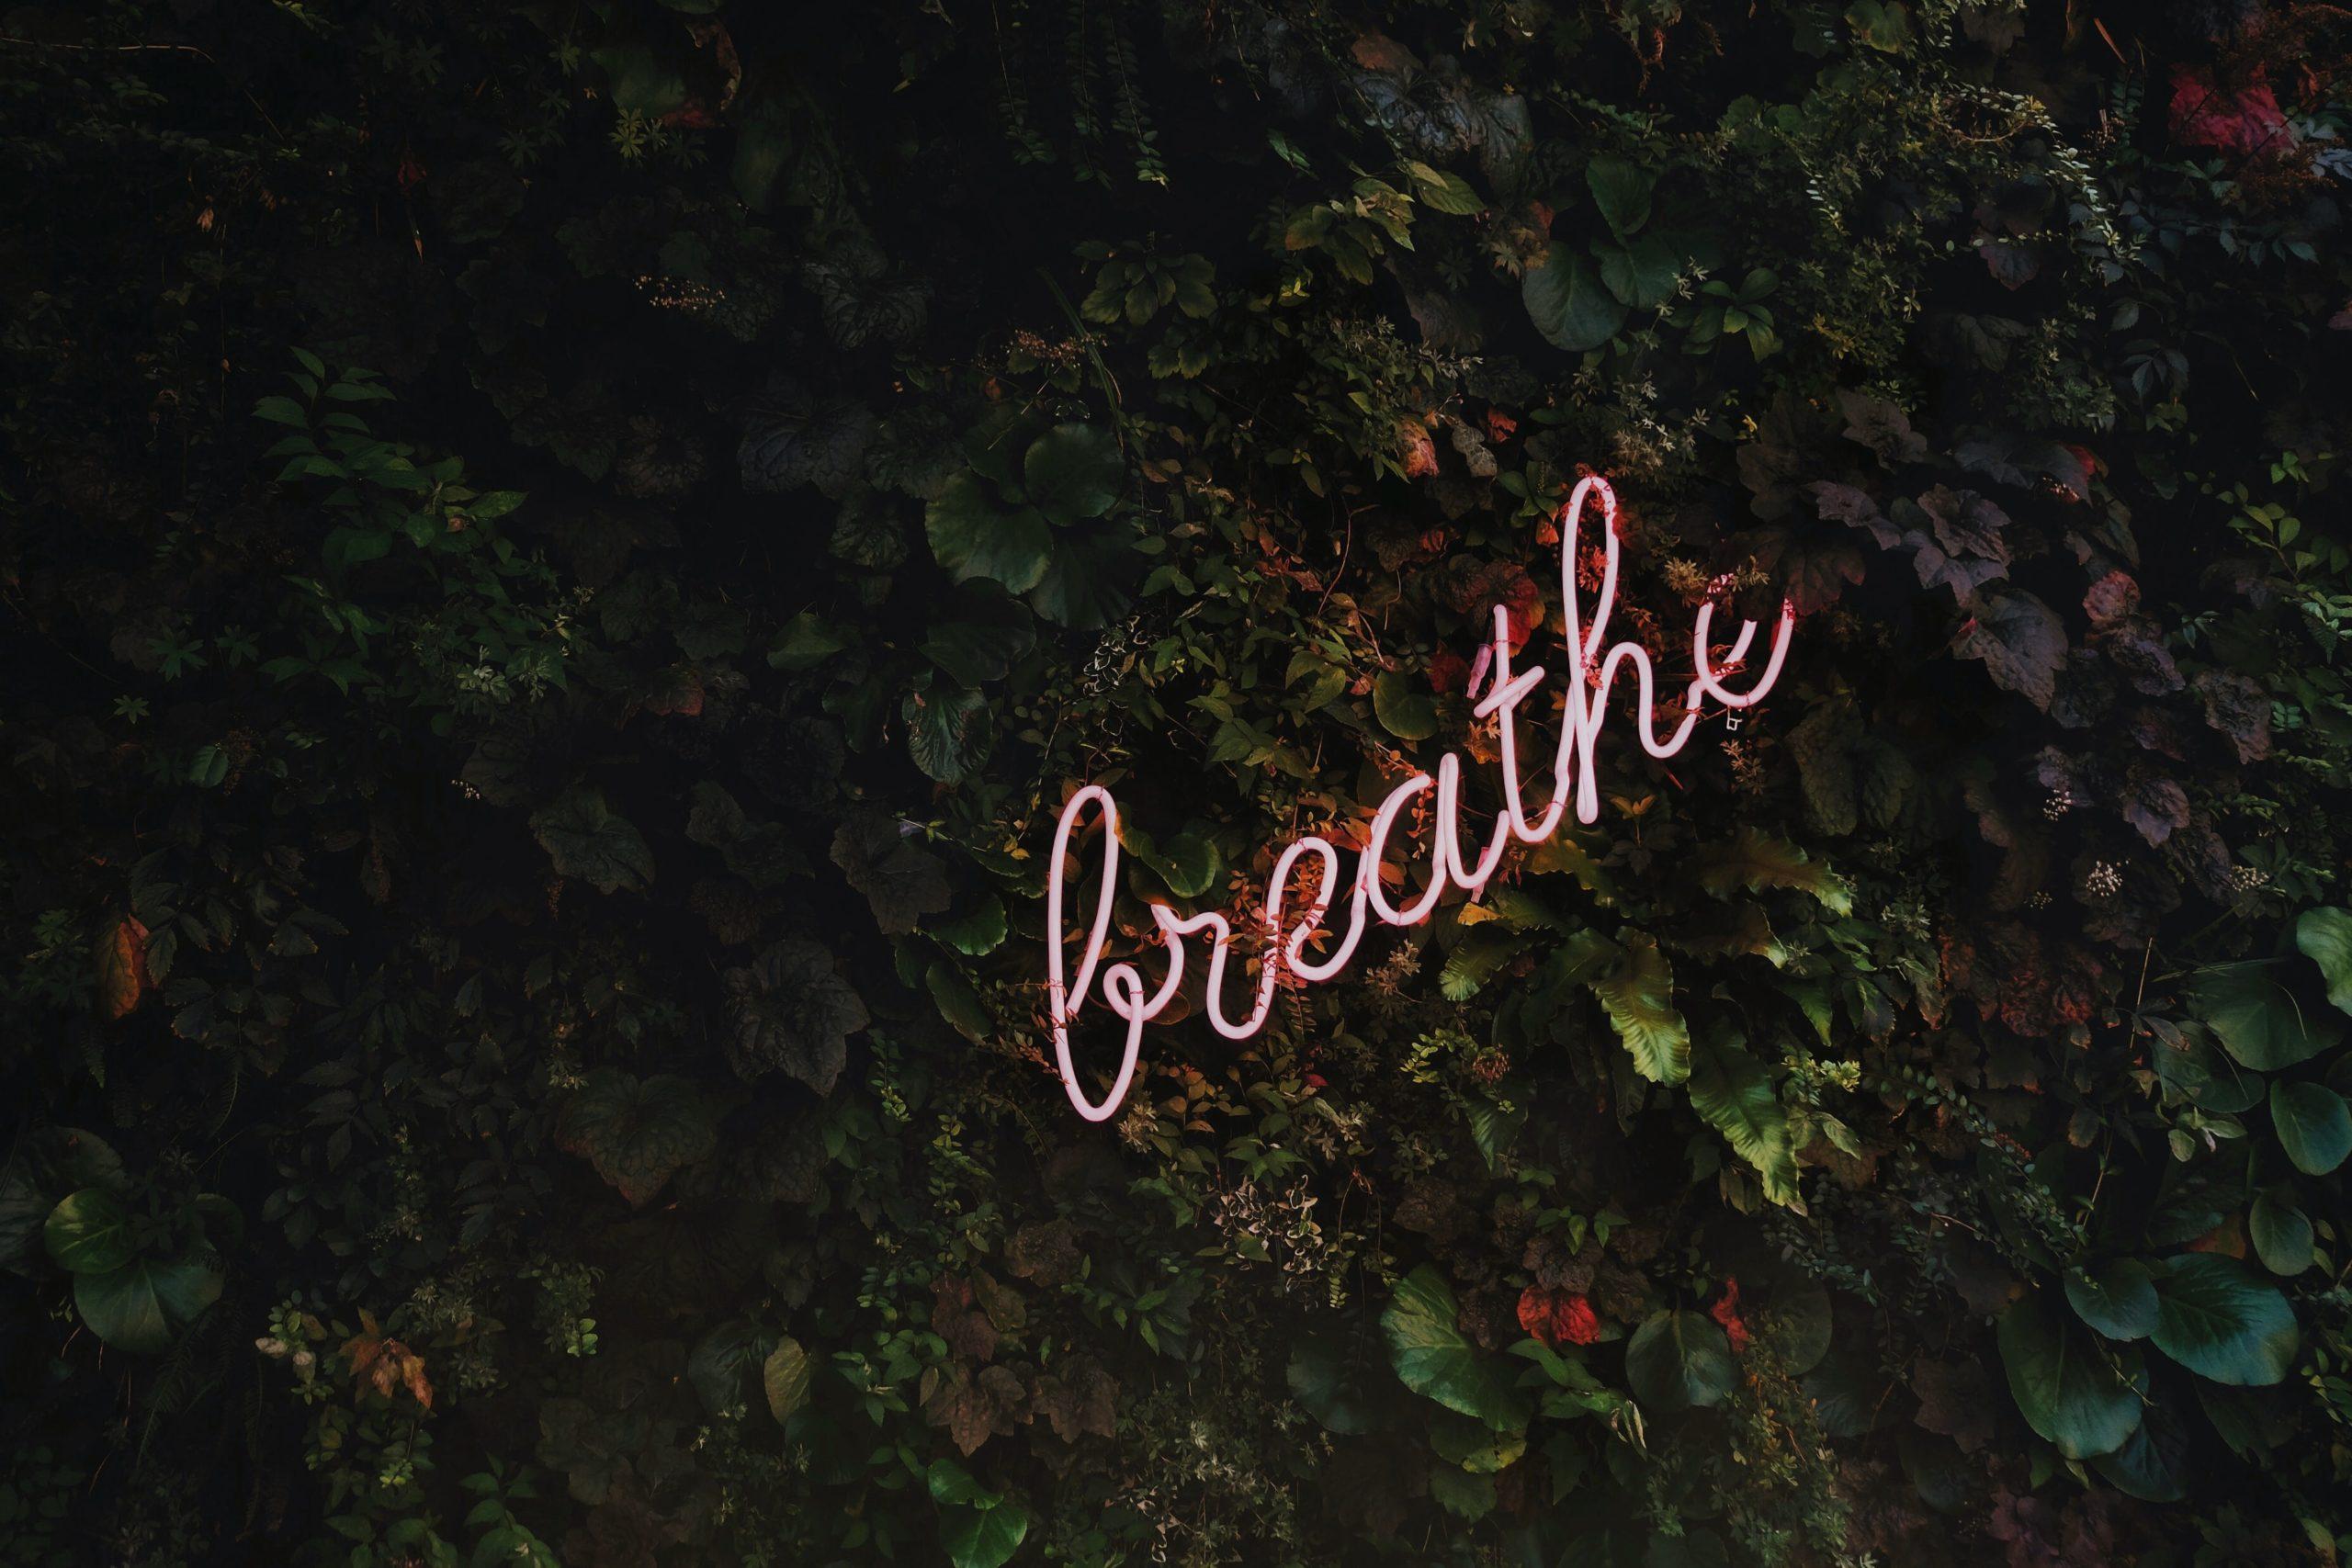 ademhalingsoefening tegen stress